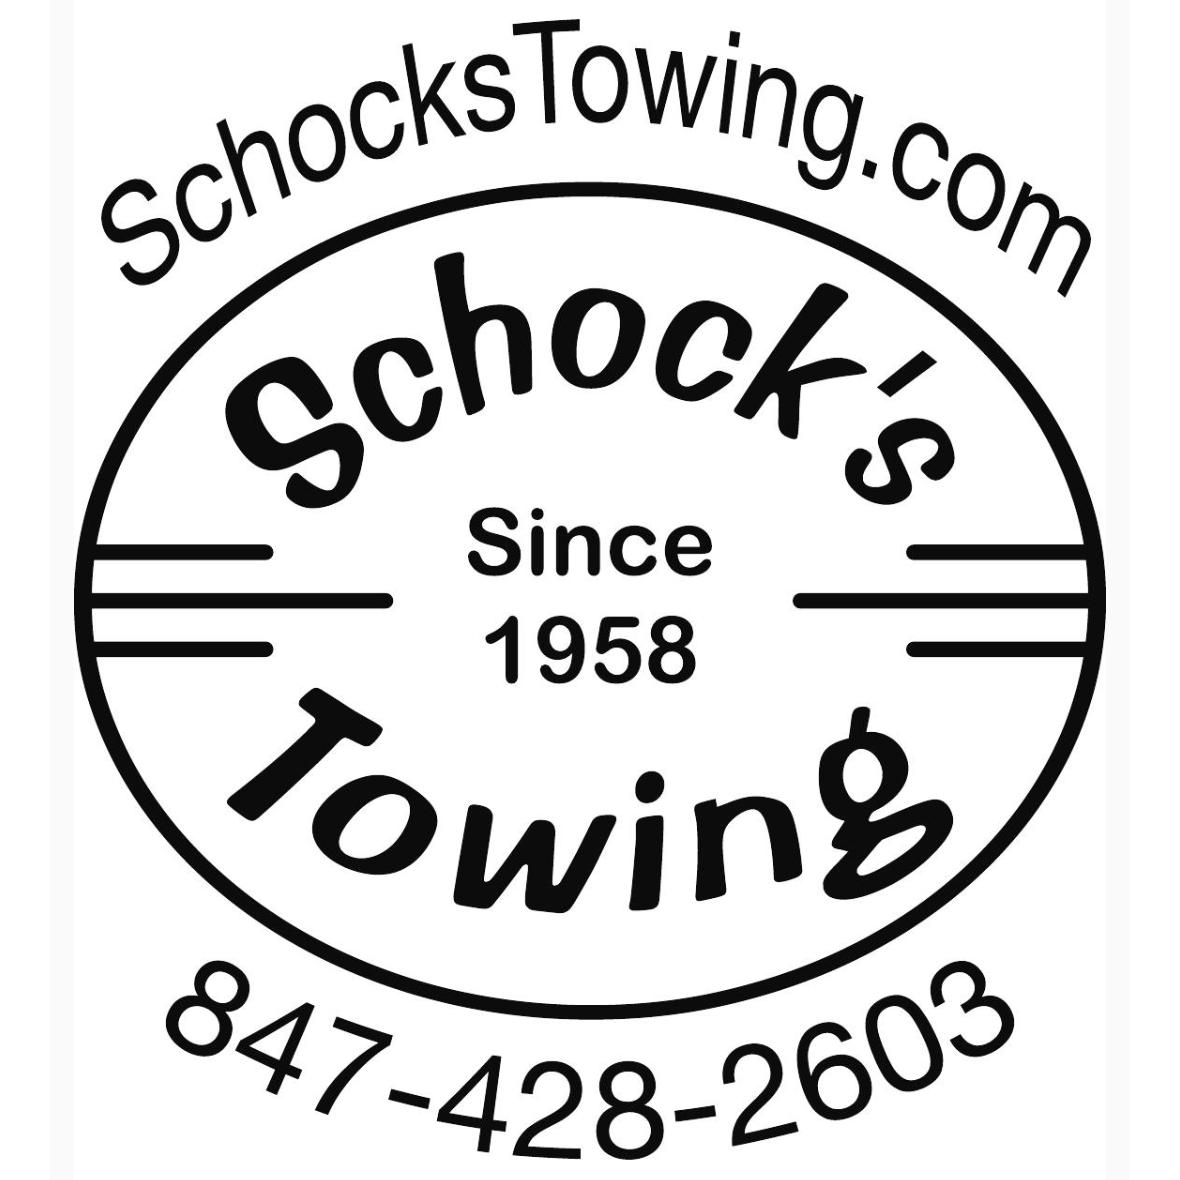 Schock's Towing Service Inc. logo